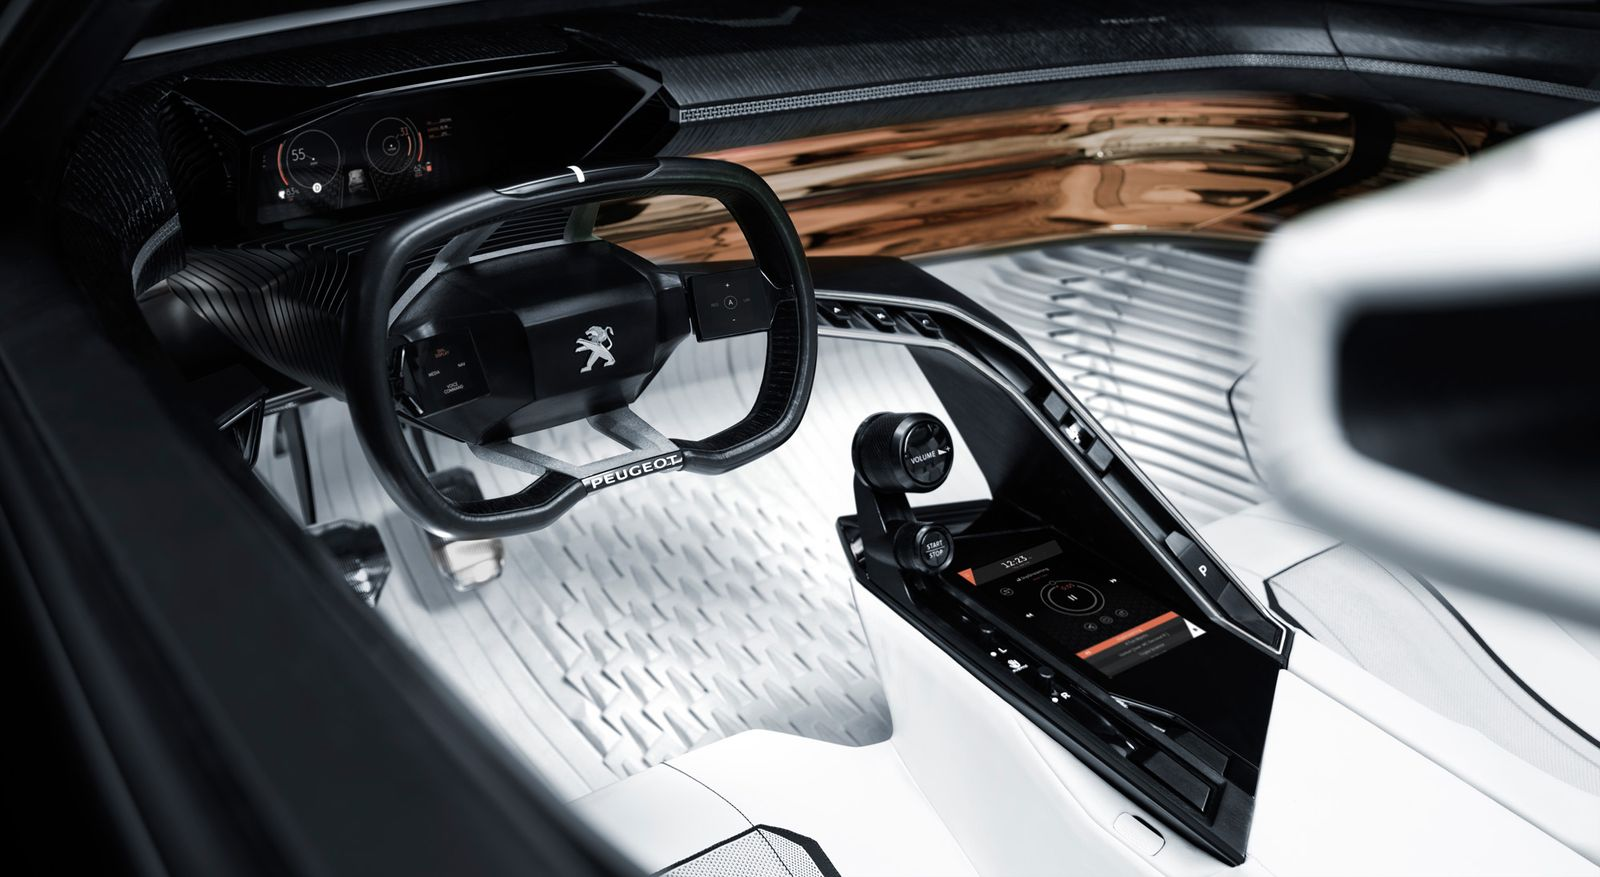 2015 / IAA / Cabrio / Peugeot Fractal